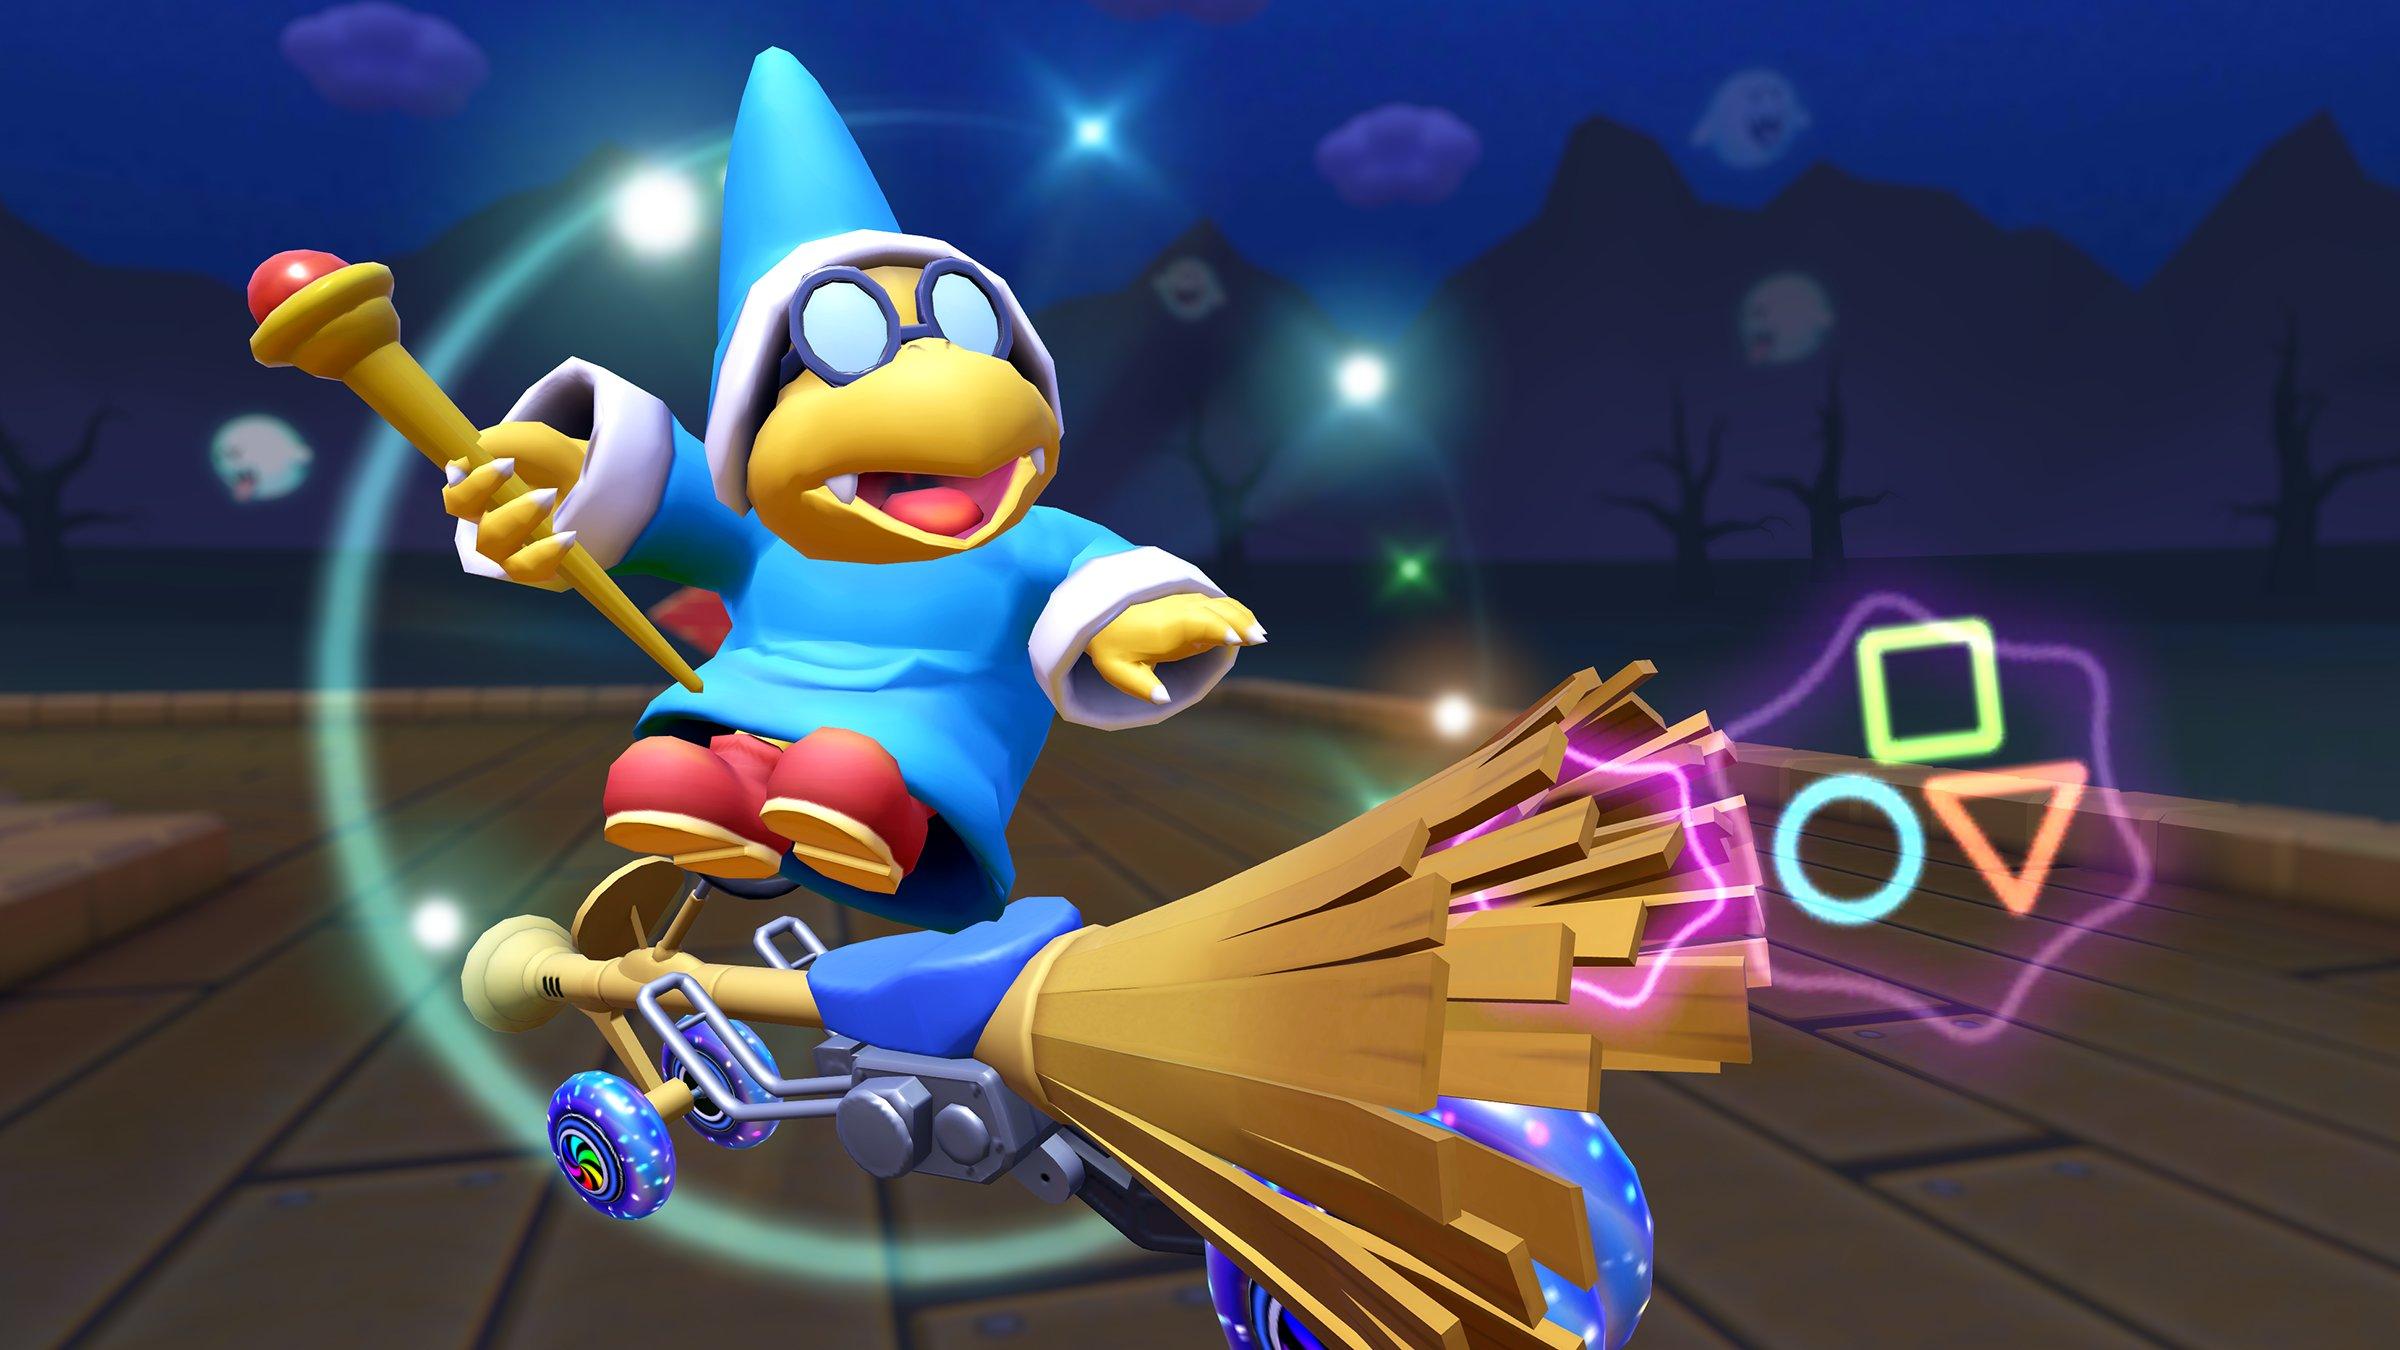 Kamek riding his broom kart in Mario Kart Tour